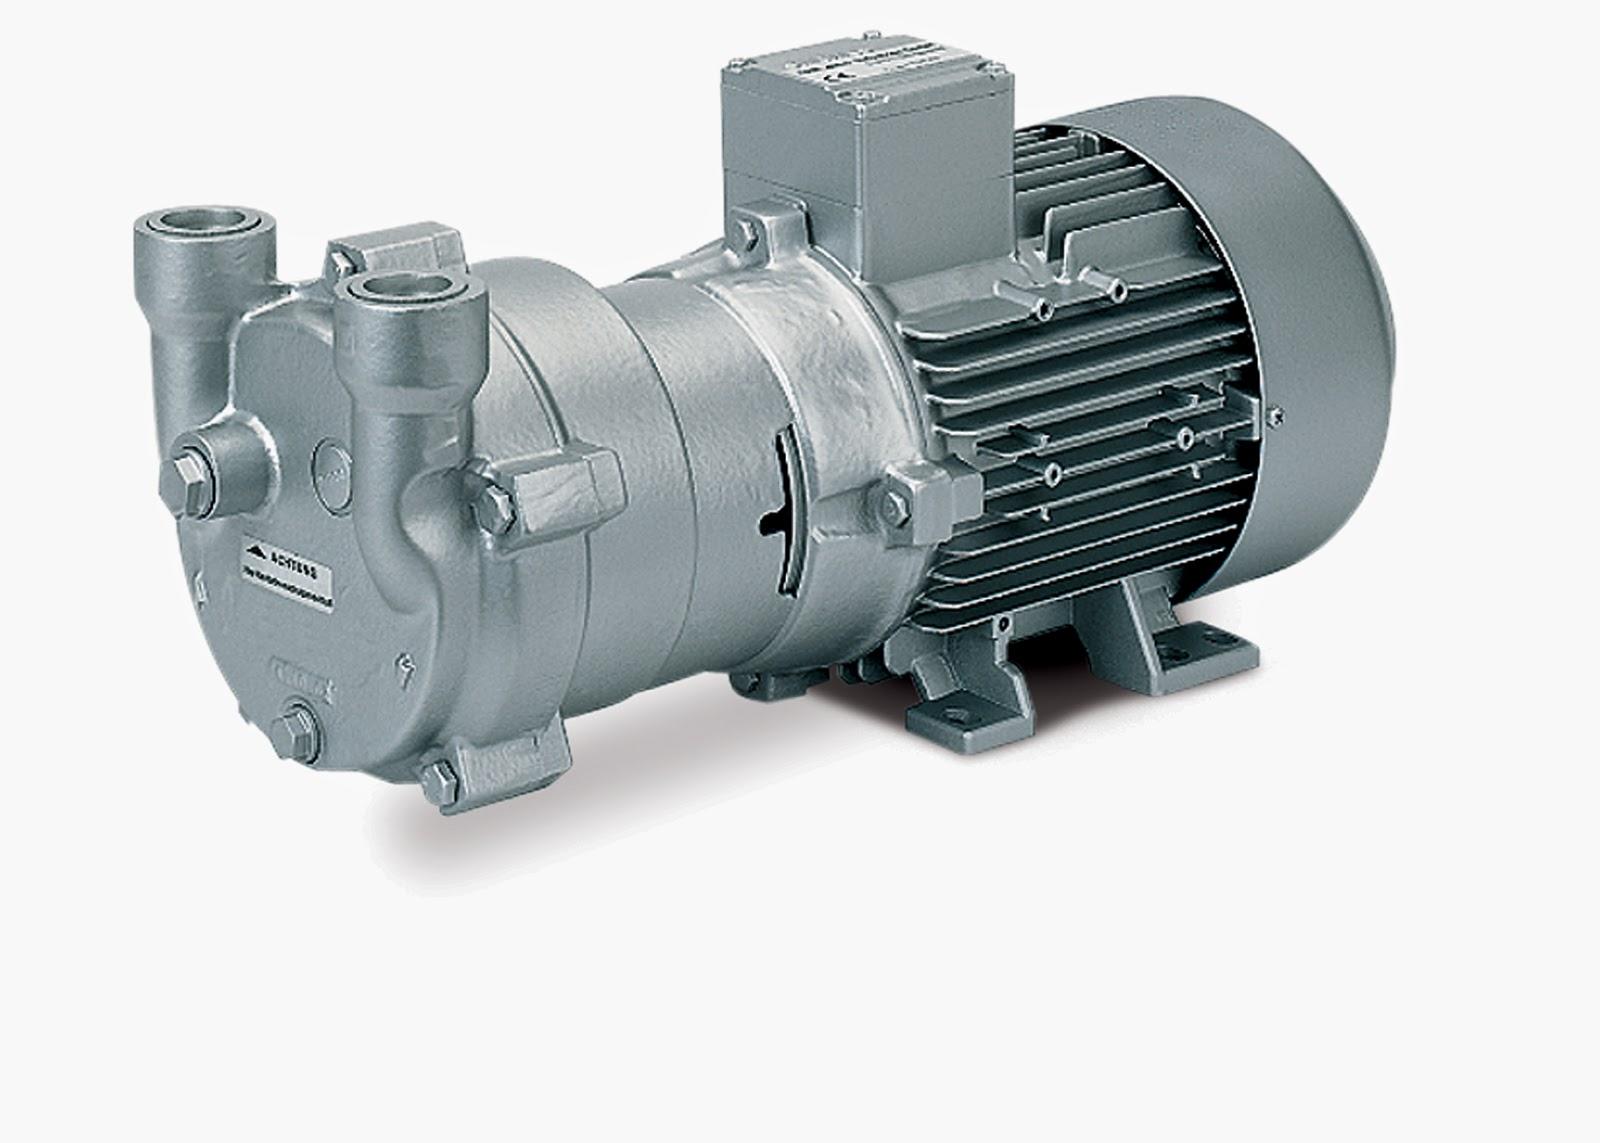 Tech West Whirlwind Liquid Ring Vacuum Pump